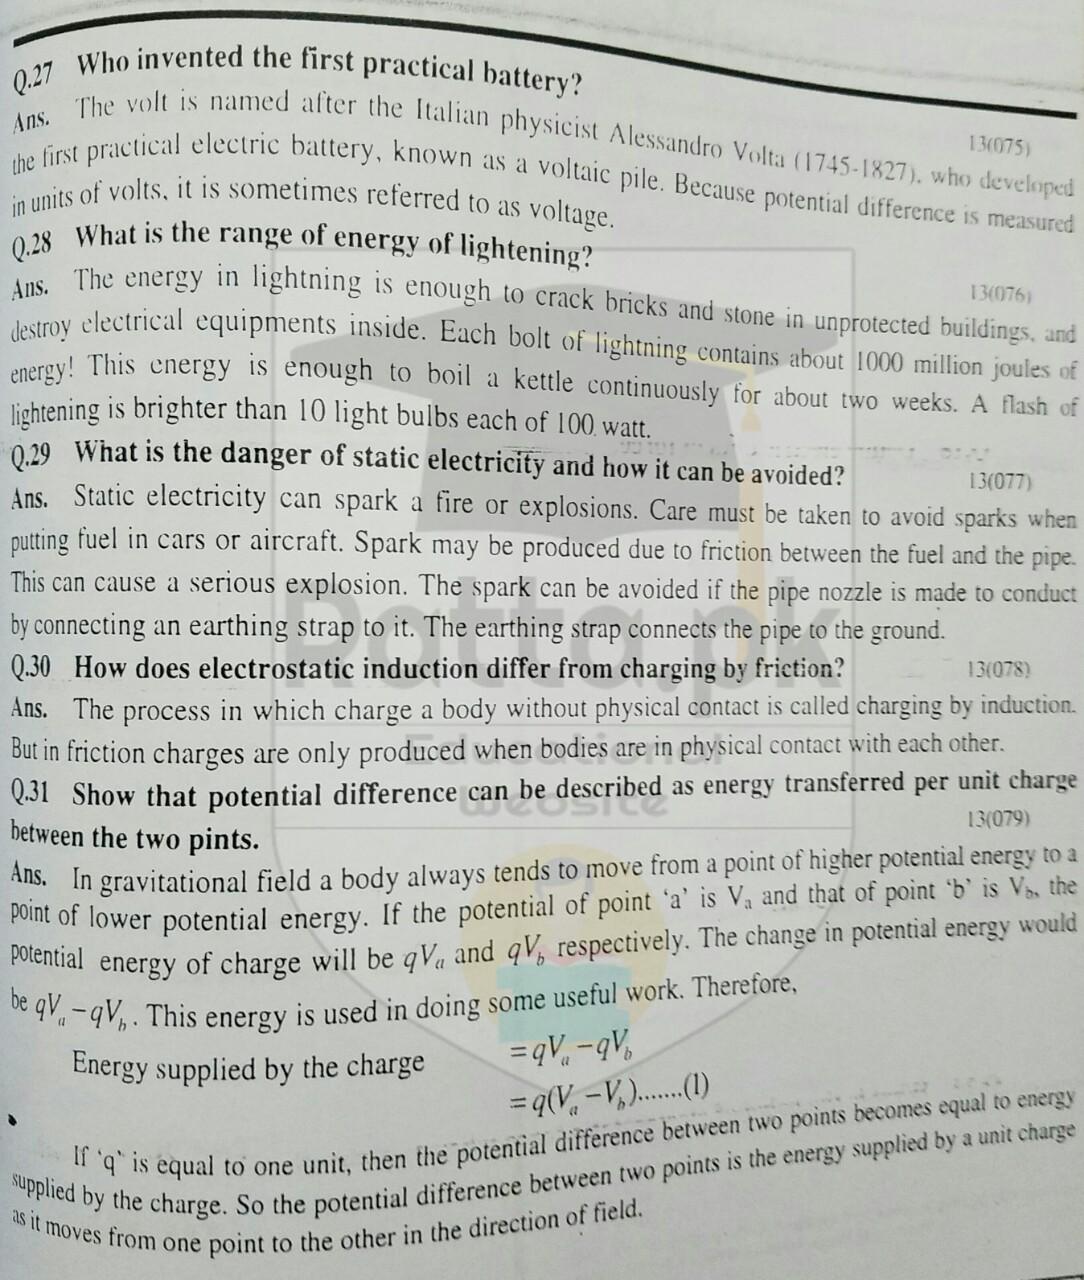 10th Physics Chapter 13 Electrostatics Short Questions 4